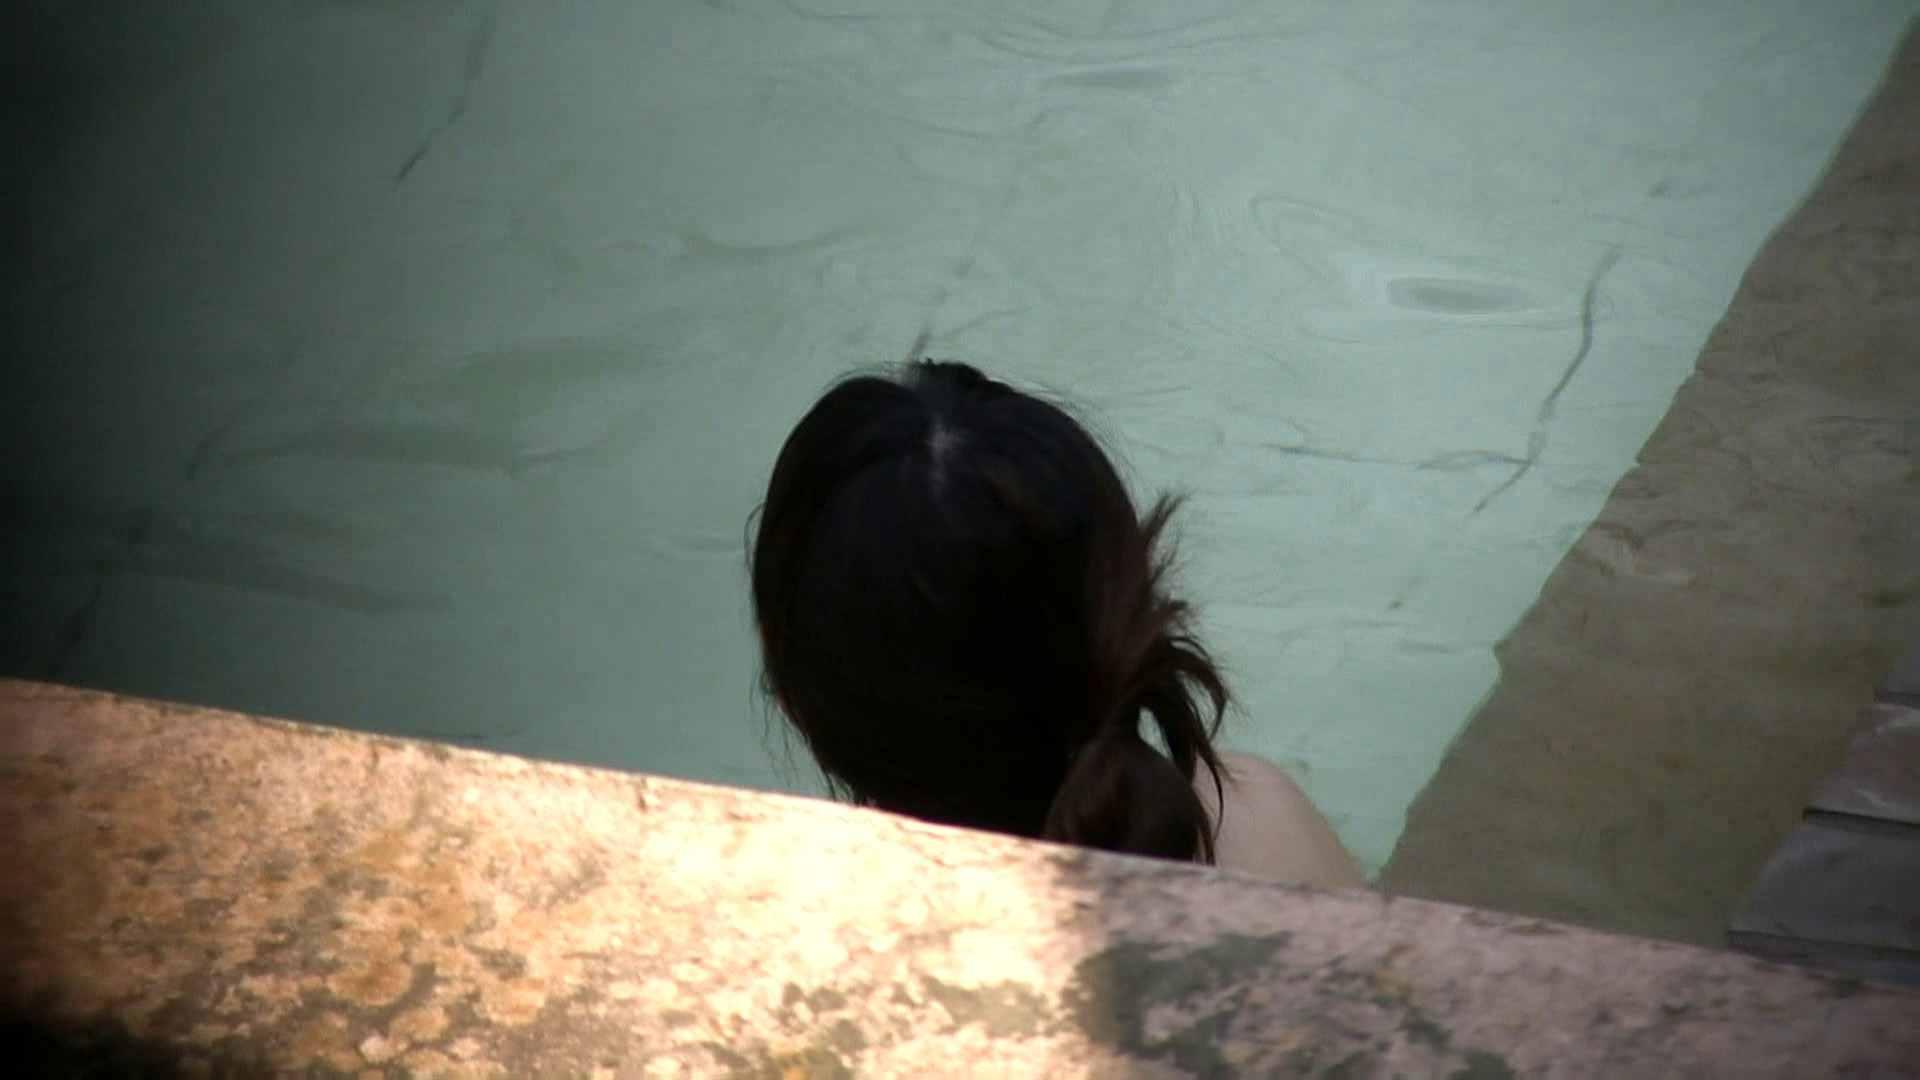 Aquaな露天風呂Vol.652 盗撮 | HなOL  105pic 9